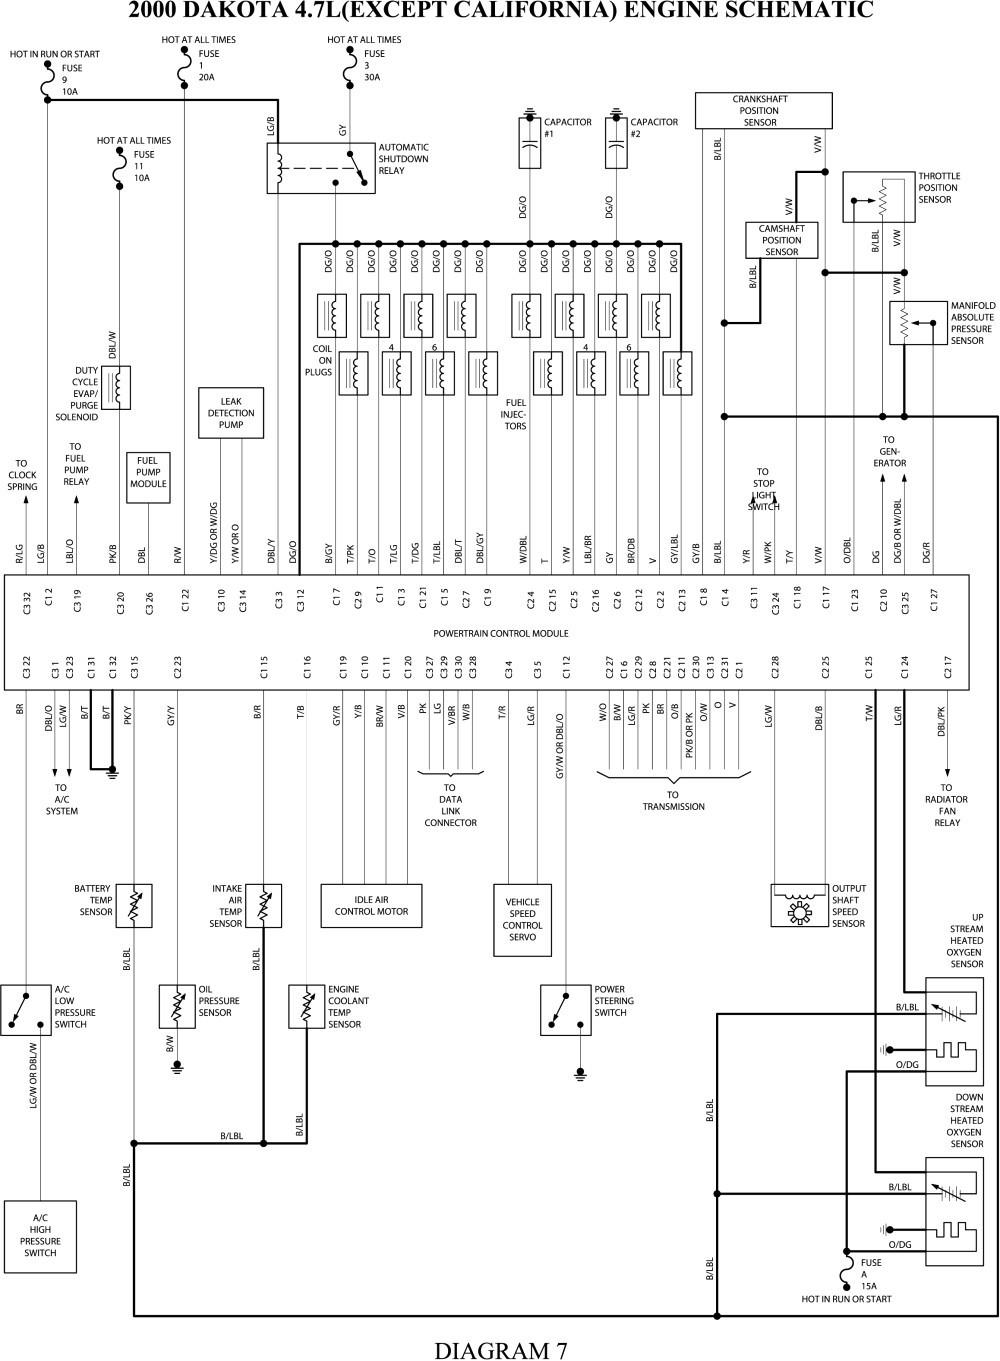 2002 dodge durango trailer wiring diagram wiring center u2022 rh trusolo co 2002 dodge durango infinity wiring diagram 2002 dodge durango stereo wiring